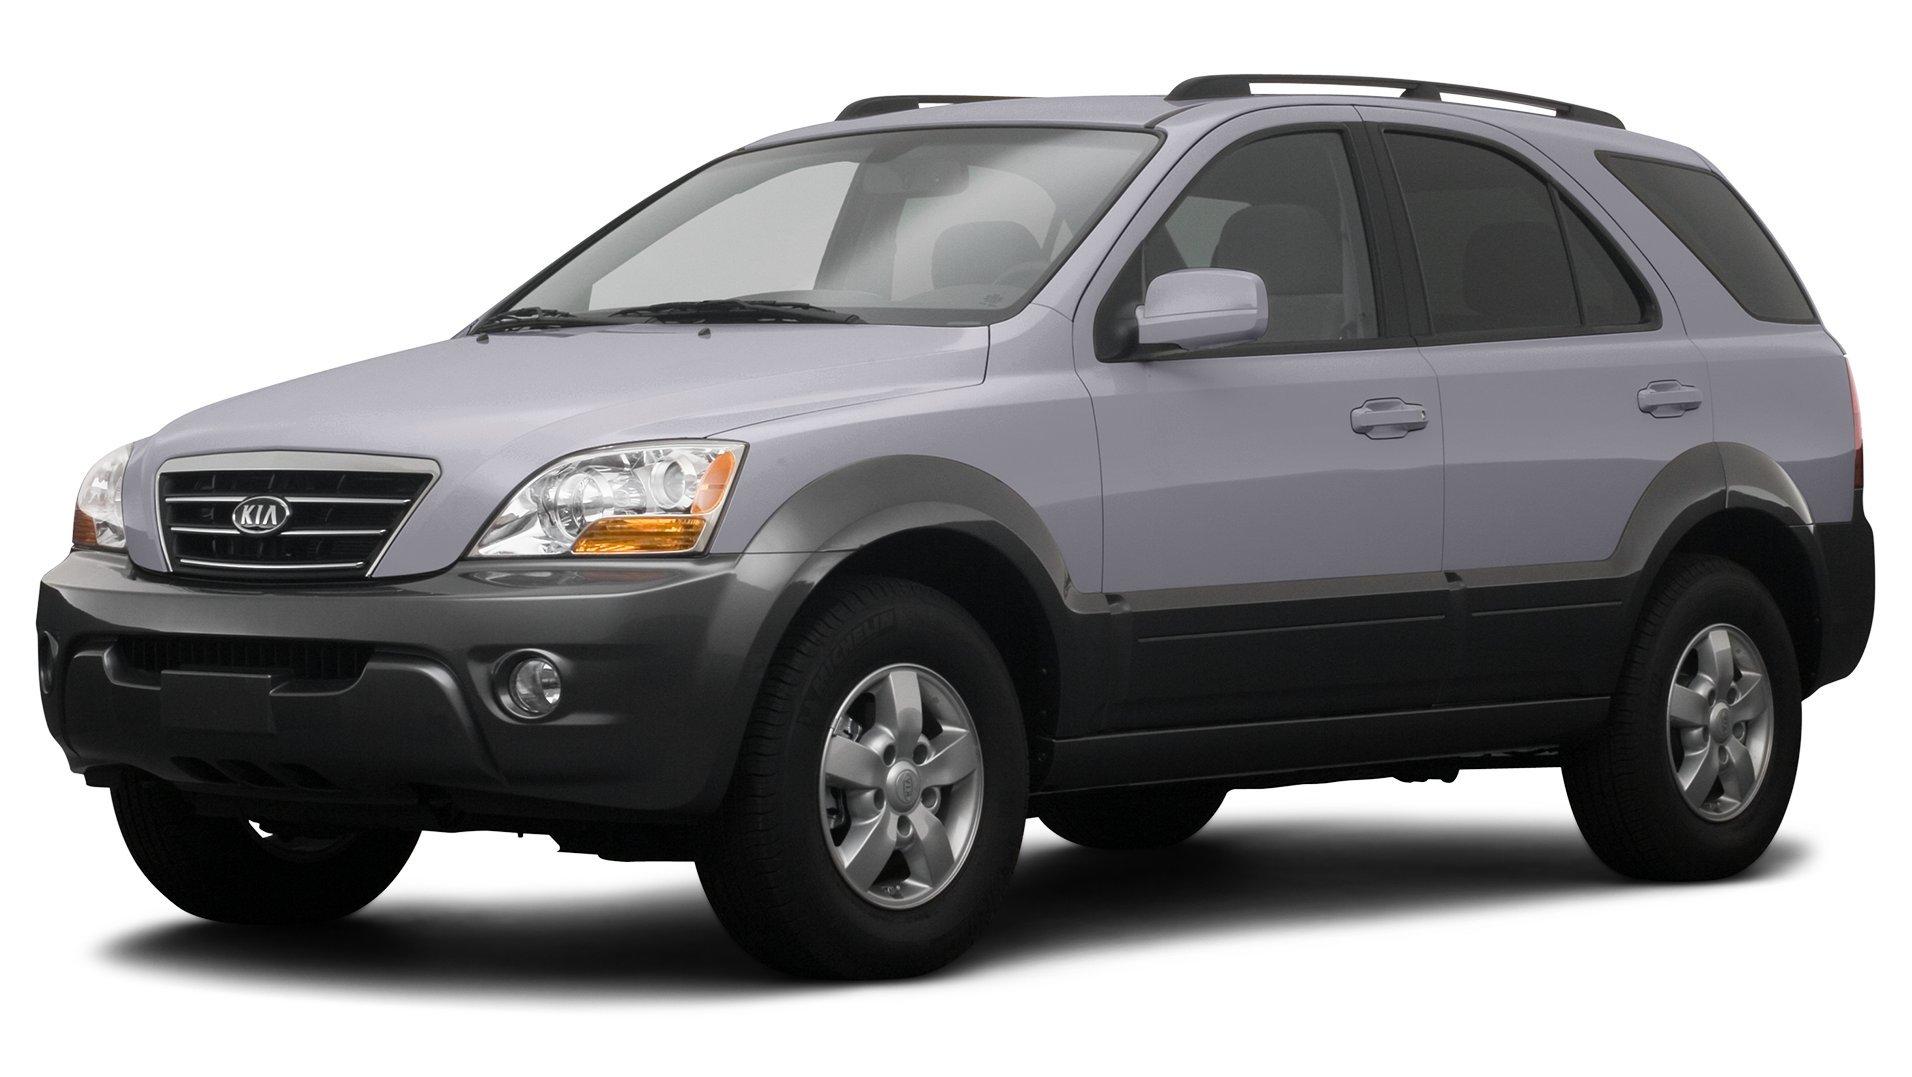 Amazoncom 2008 Kia Sorento Reviews Images and Specs Vehicles